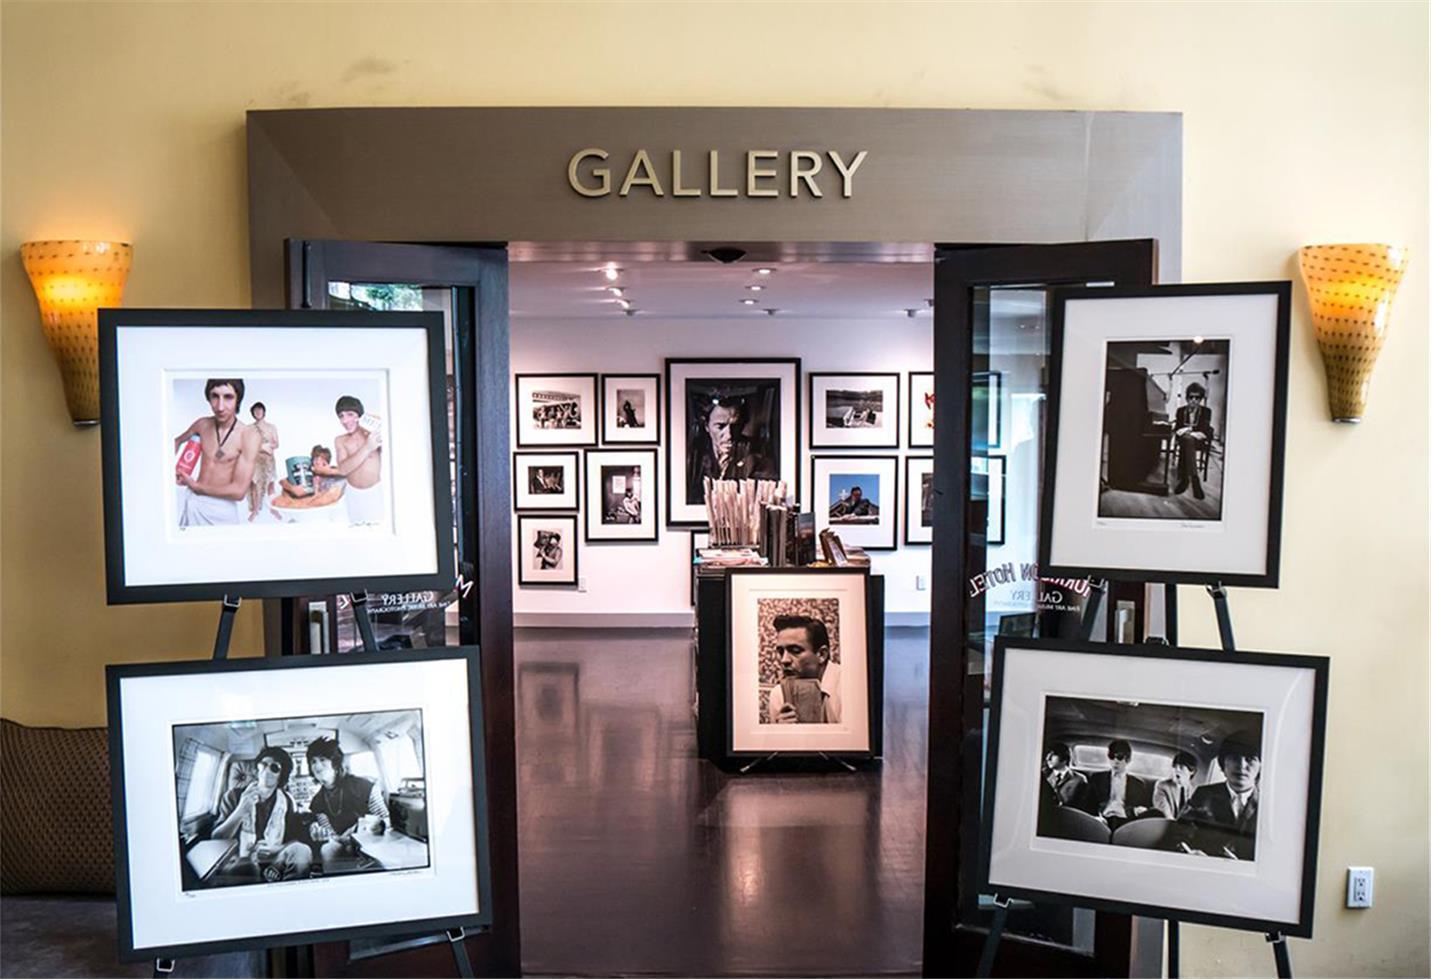 Image Galleries